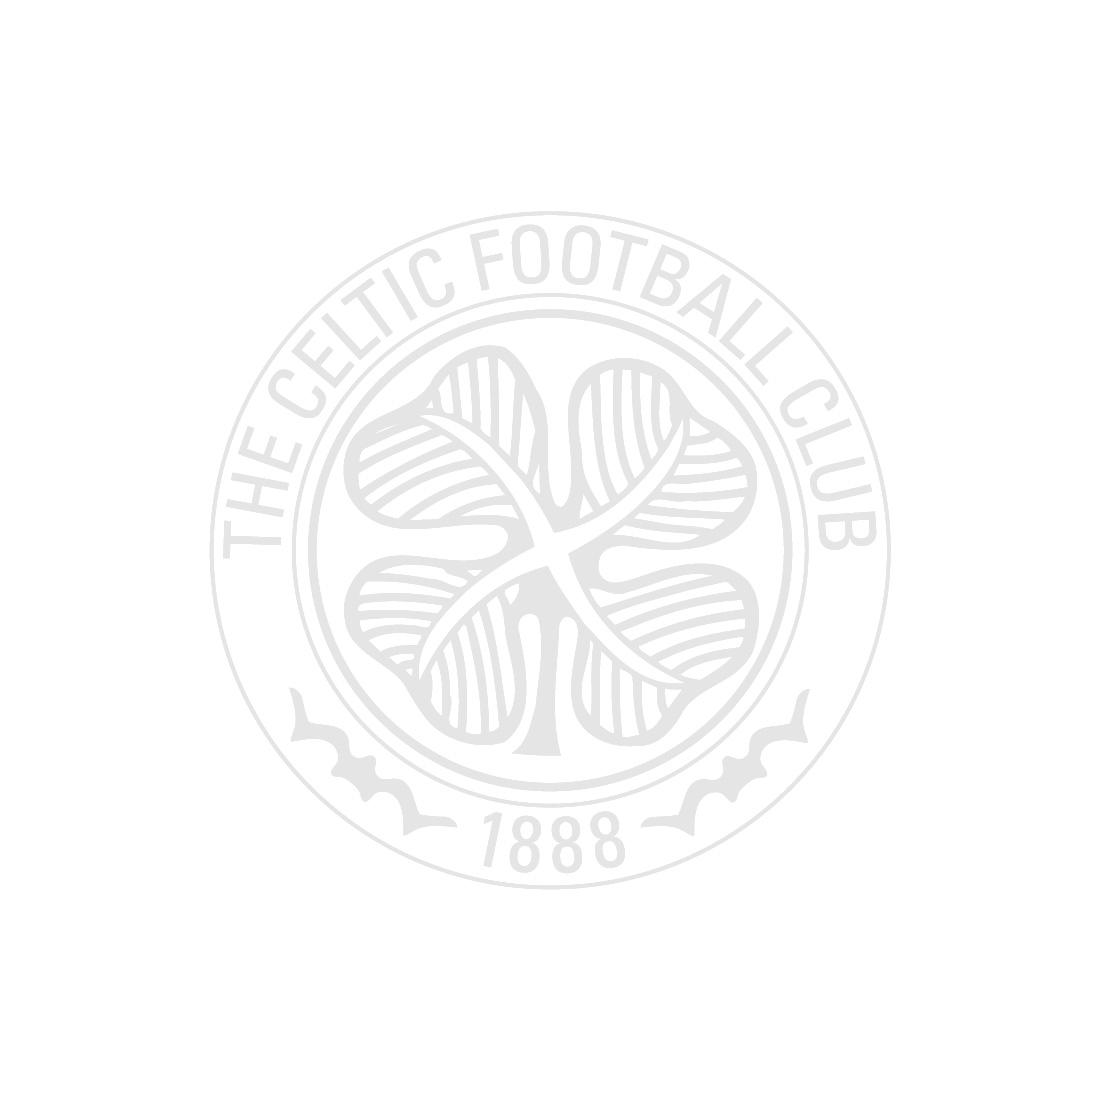 Celtic Backstreet Best Wishes Card